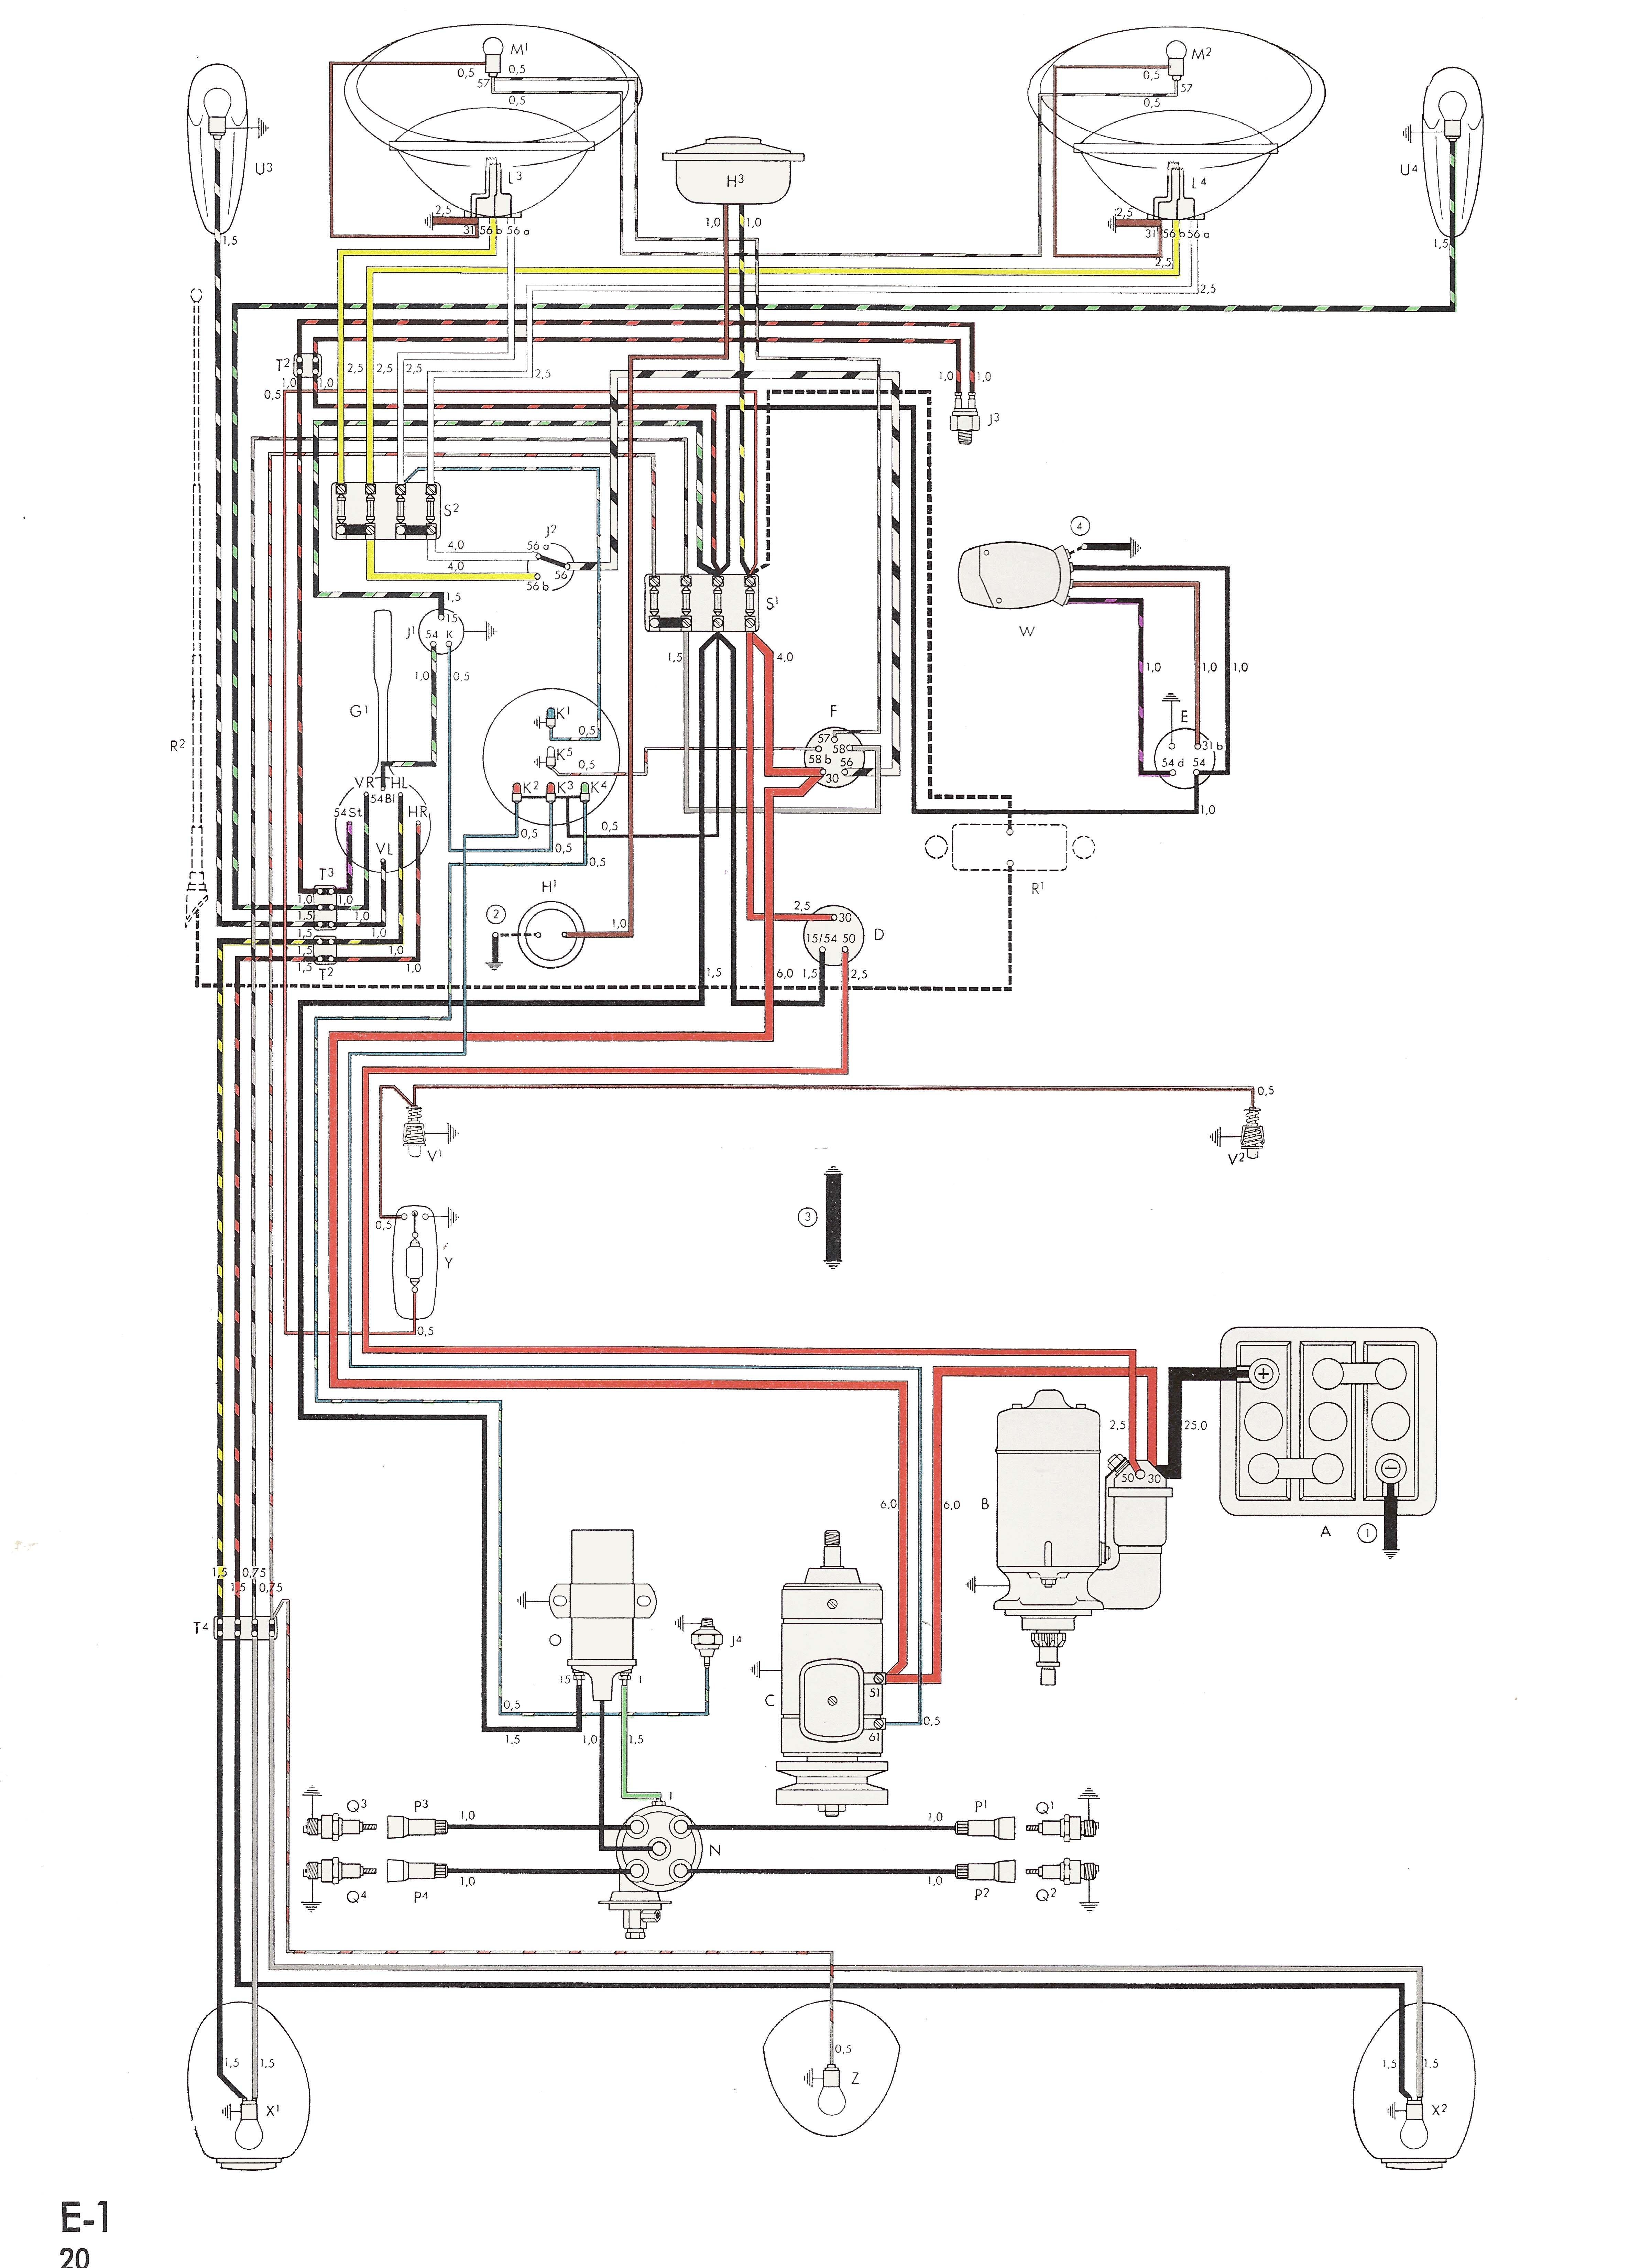 melex gas golf cart wiring diagram 1995 johnson 115 for g5 yamaha ydra